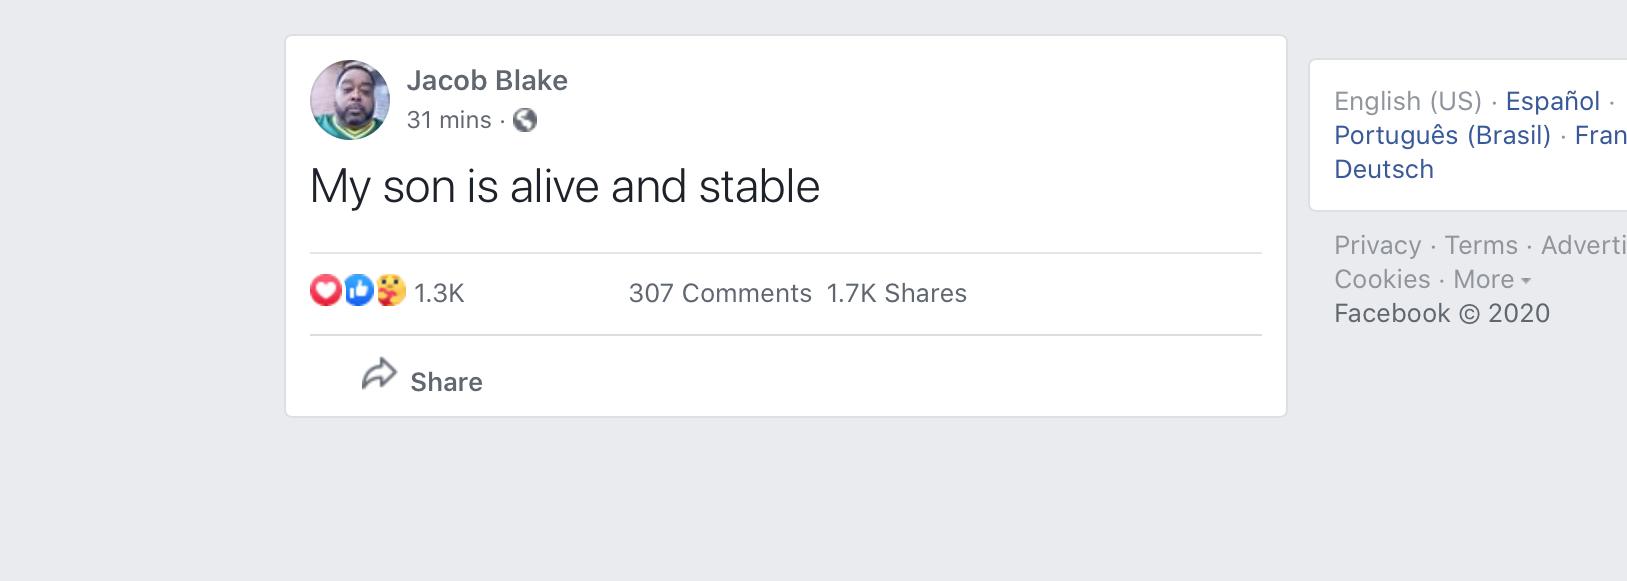 "🌞🖖🏻 Harcourt Fenton Mudd ✌🏻🌞 on Twitter: ""On #Facebook his father  says, ""my son is alive and stable"" #JacobBlake #Kenosha #kenoshawisconsin  https://t.co/jtiqJ0KZyv… https://t.co/tGznOkd8Ze"""